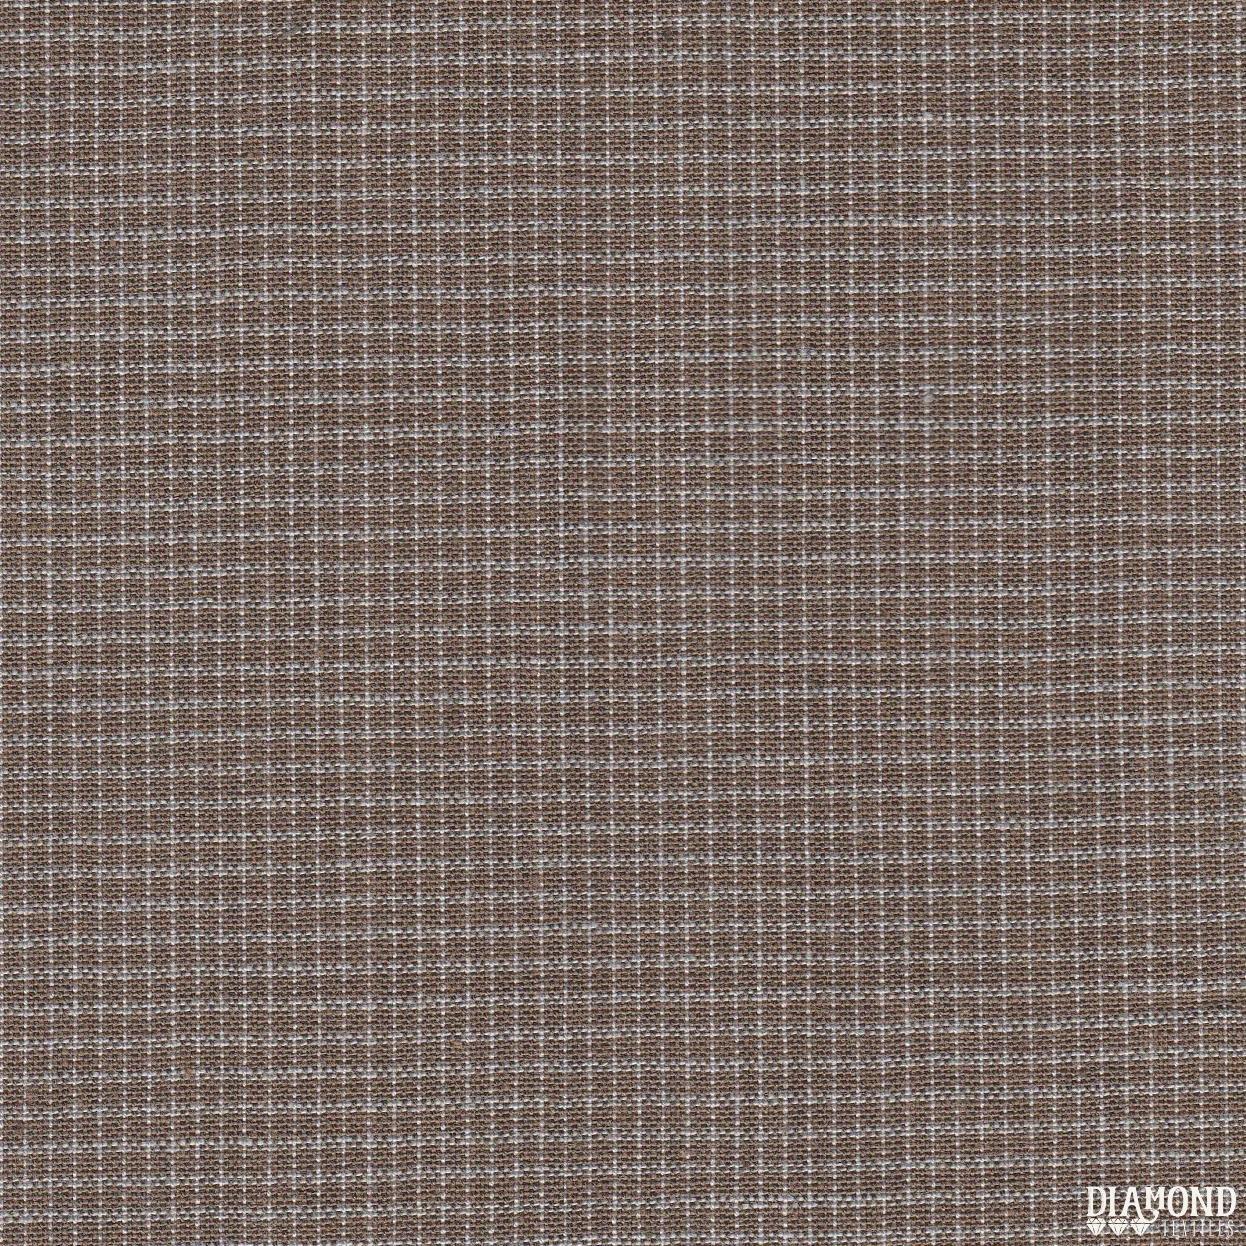 Manchester 3096 - Woven Cotton